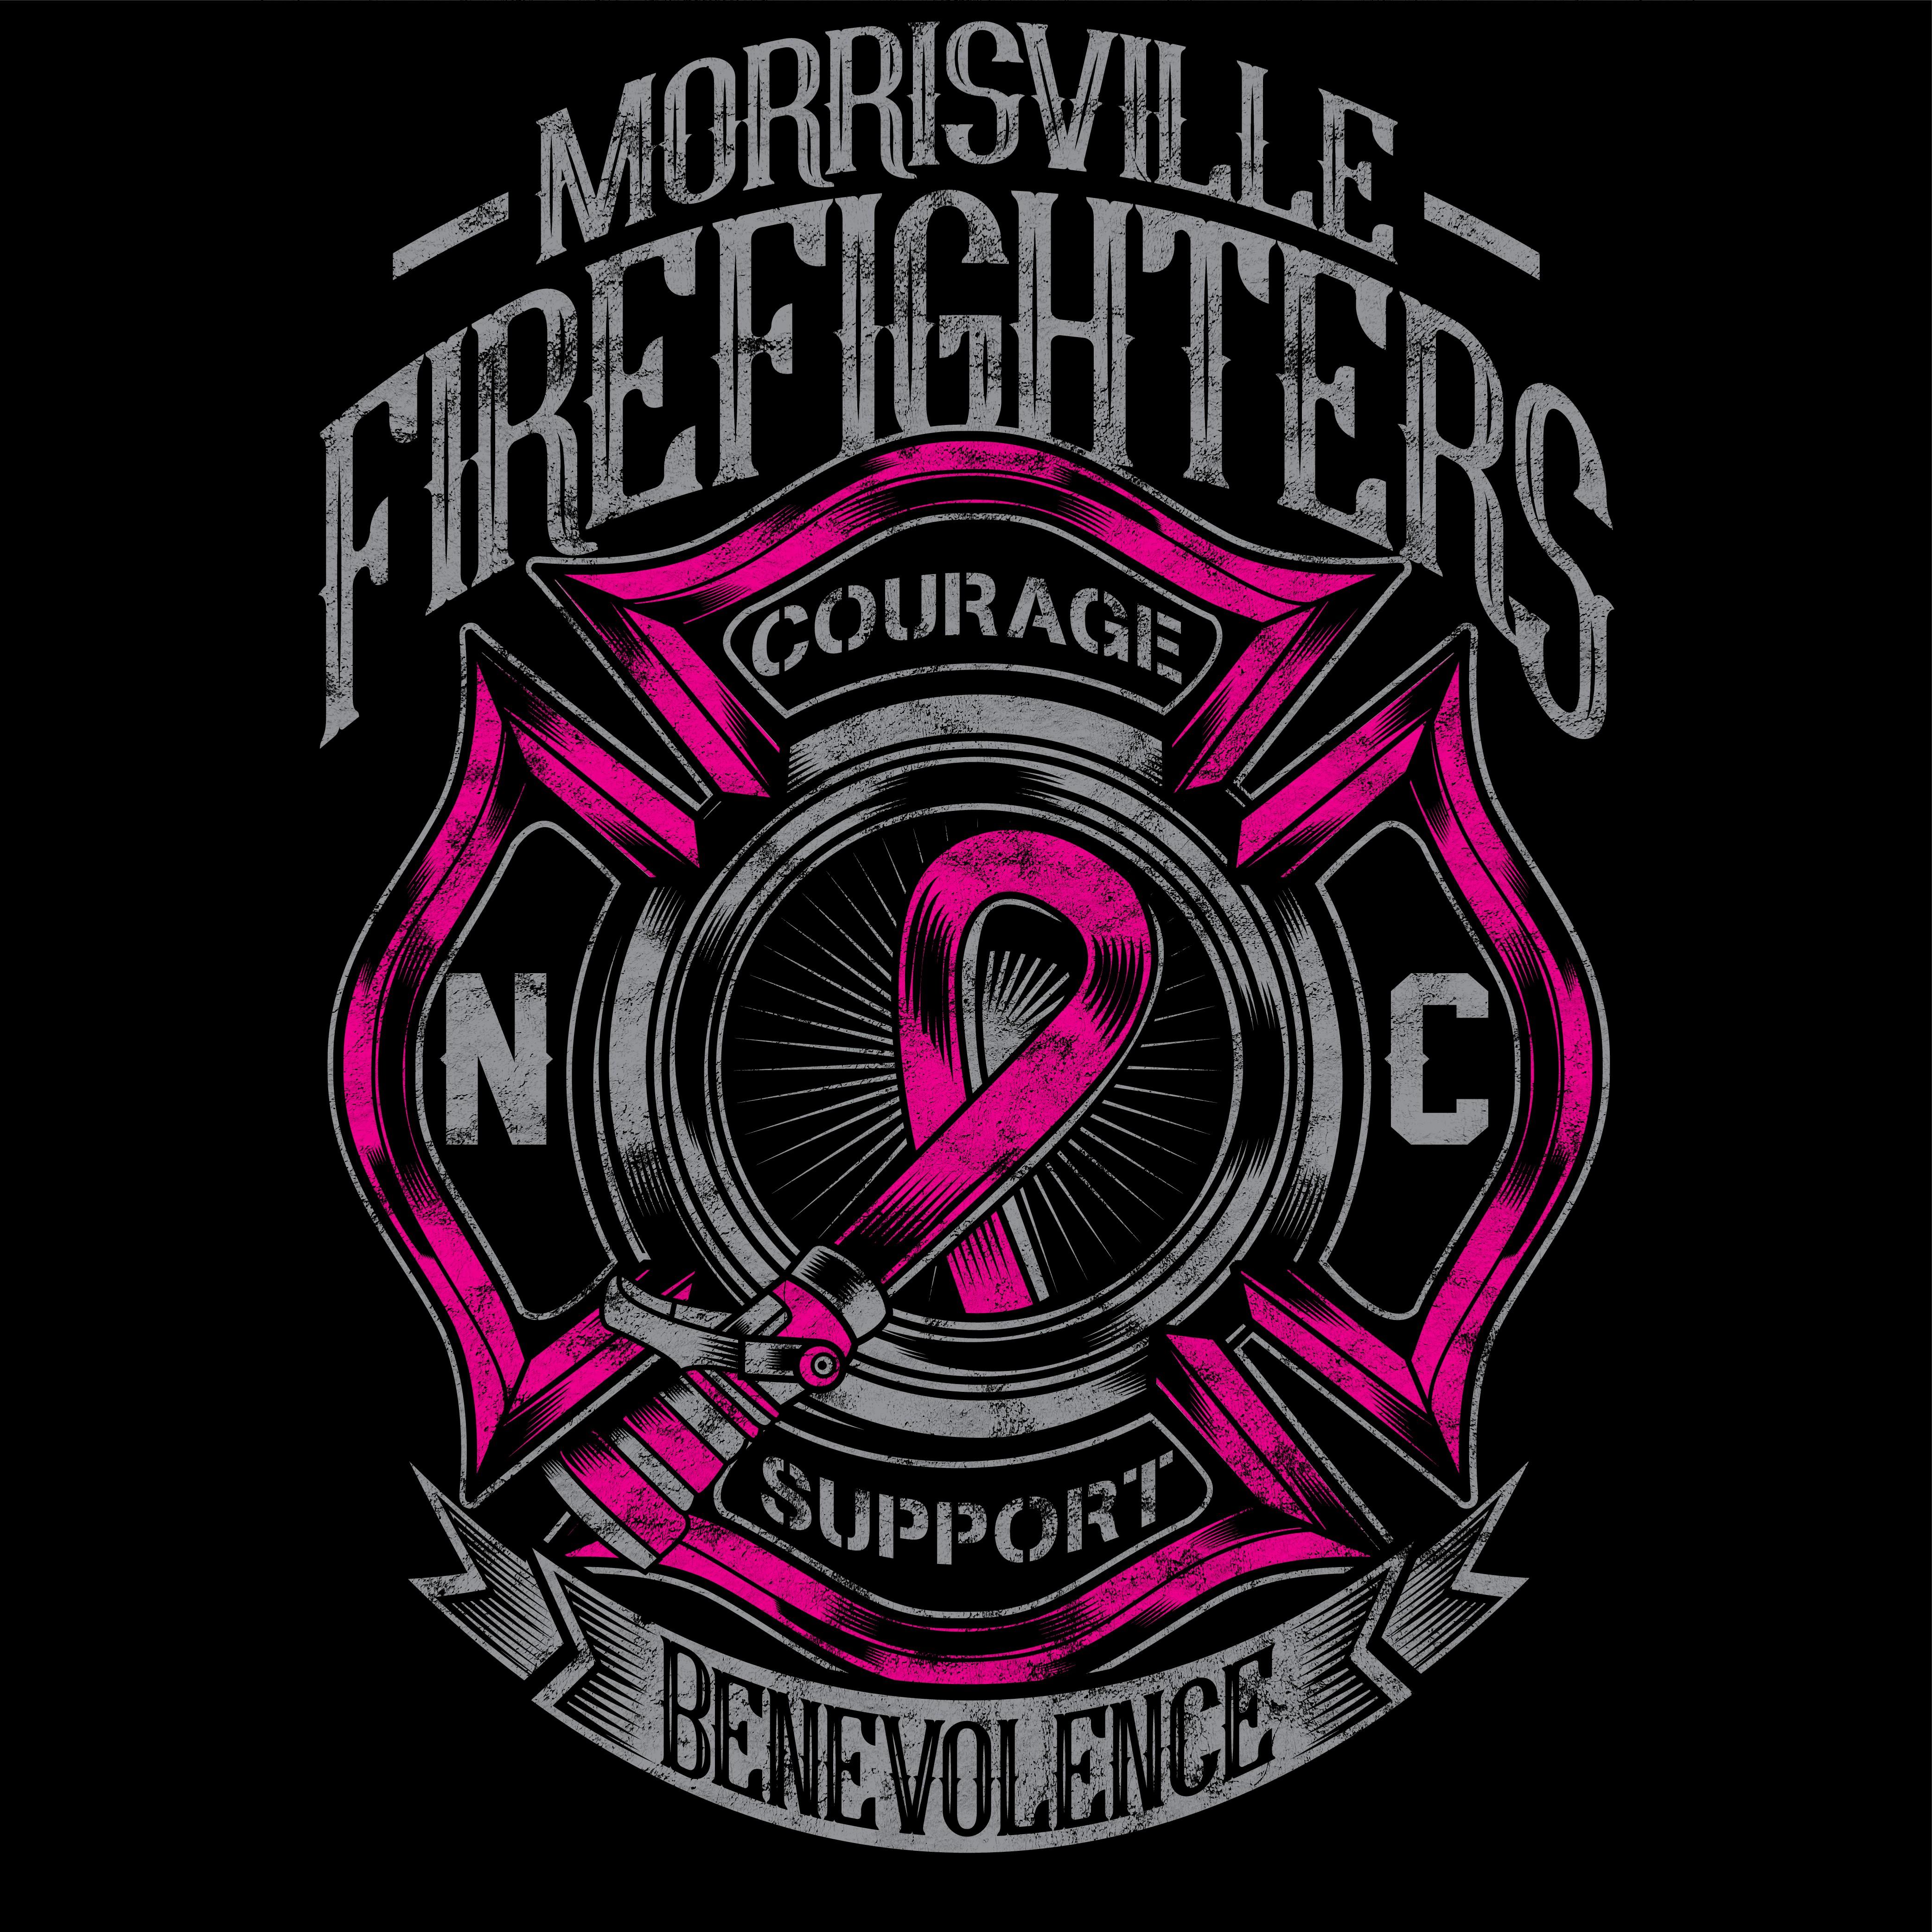 Morrisville Firefighter Benevolence Cancer Awareness